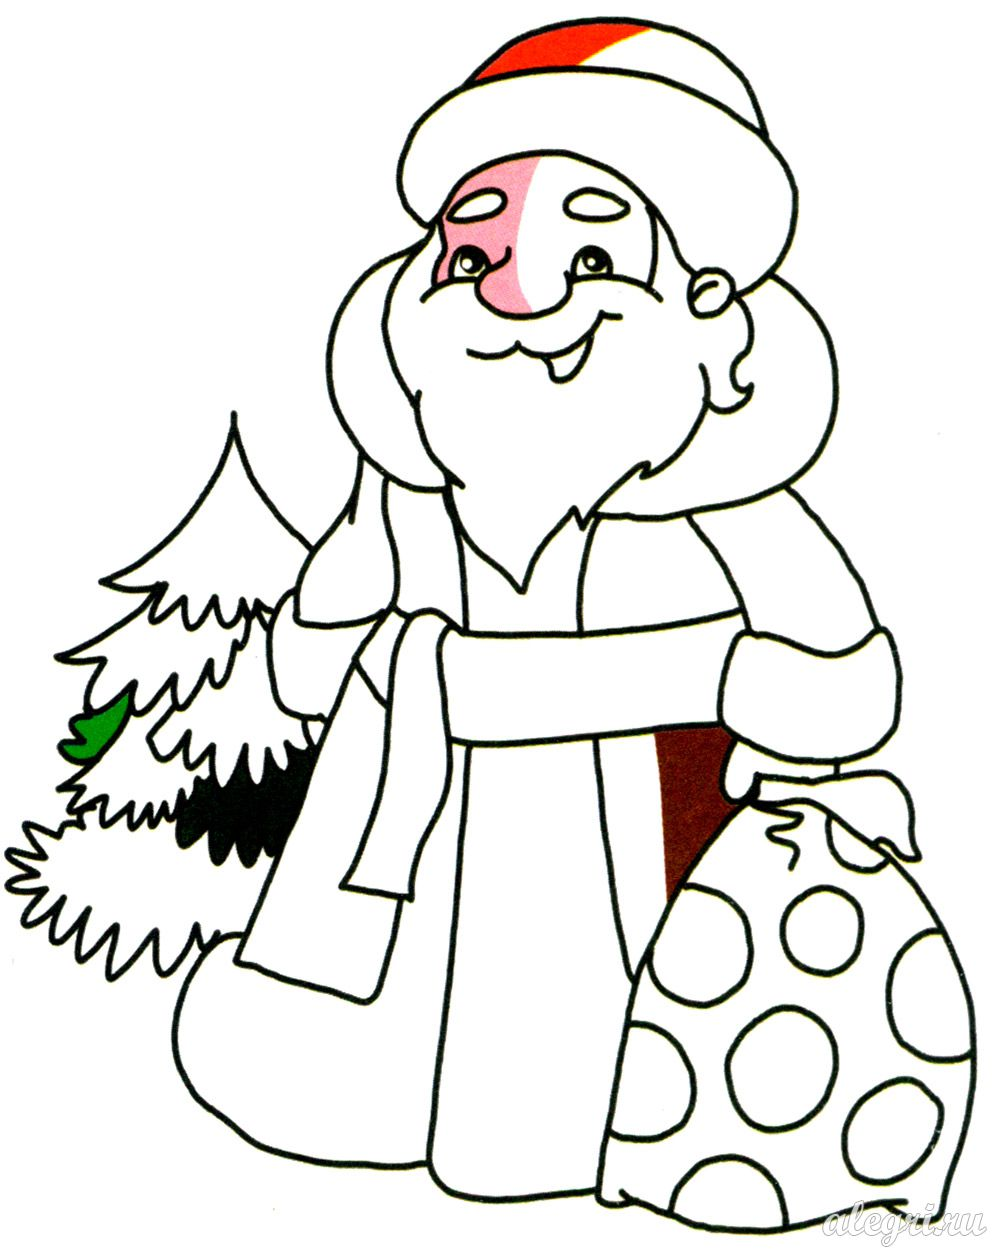 Раскраска. Дед Мороз с подарками